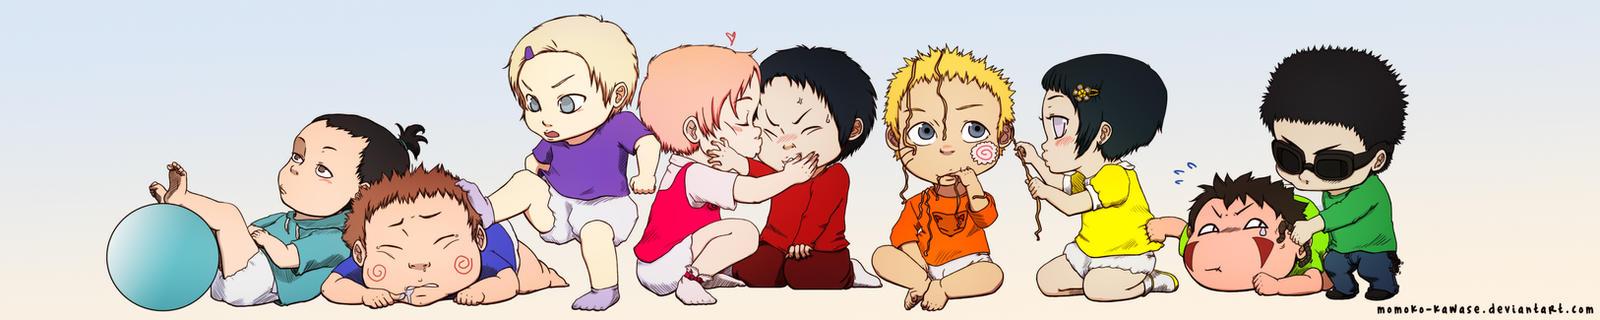 Naruto babies collaboration by gabzillaz